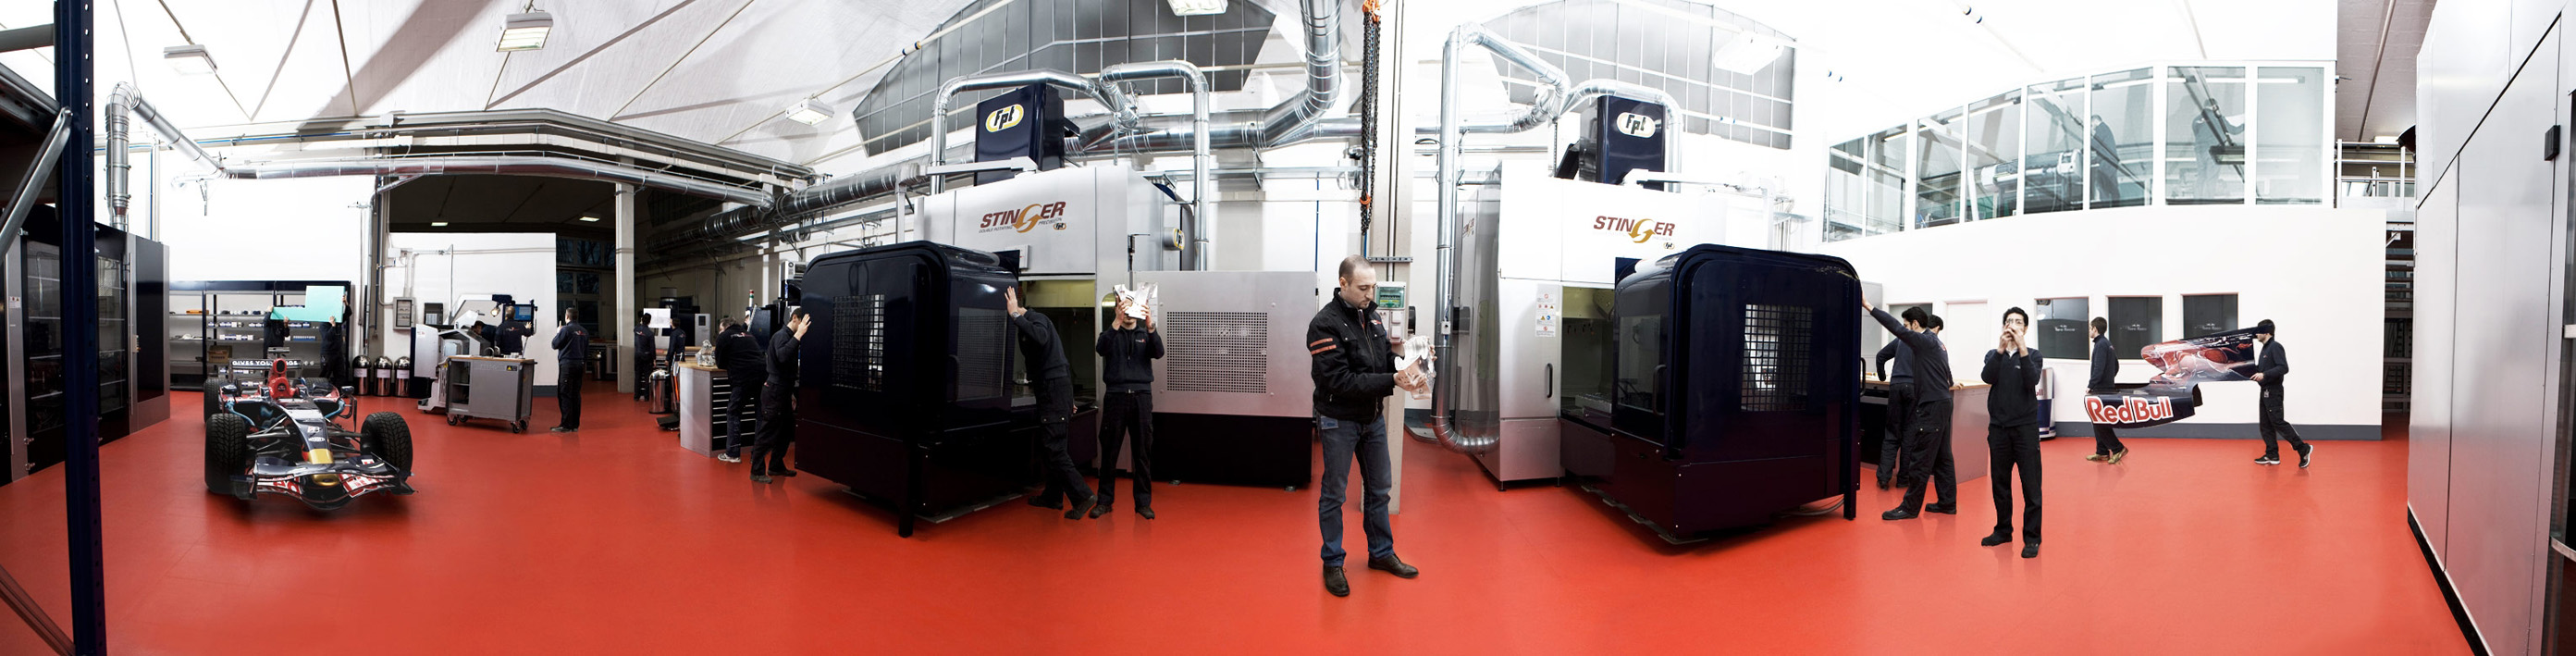 STR online interactive press pack, machine shop panorama